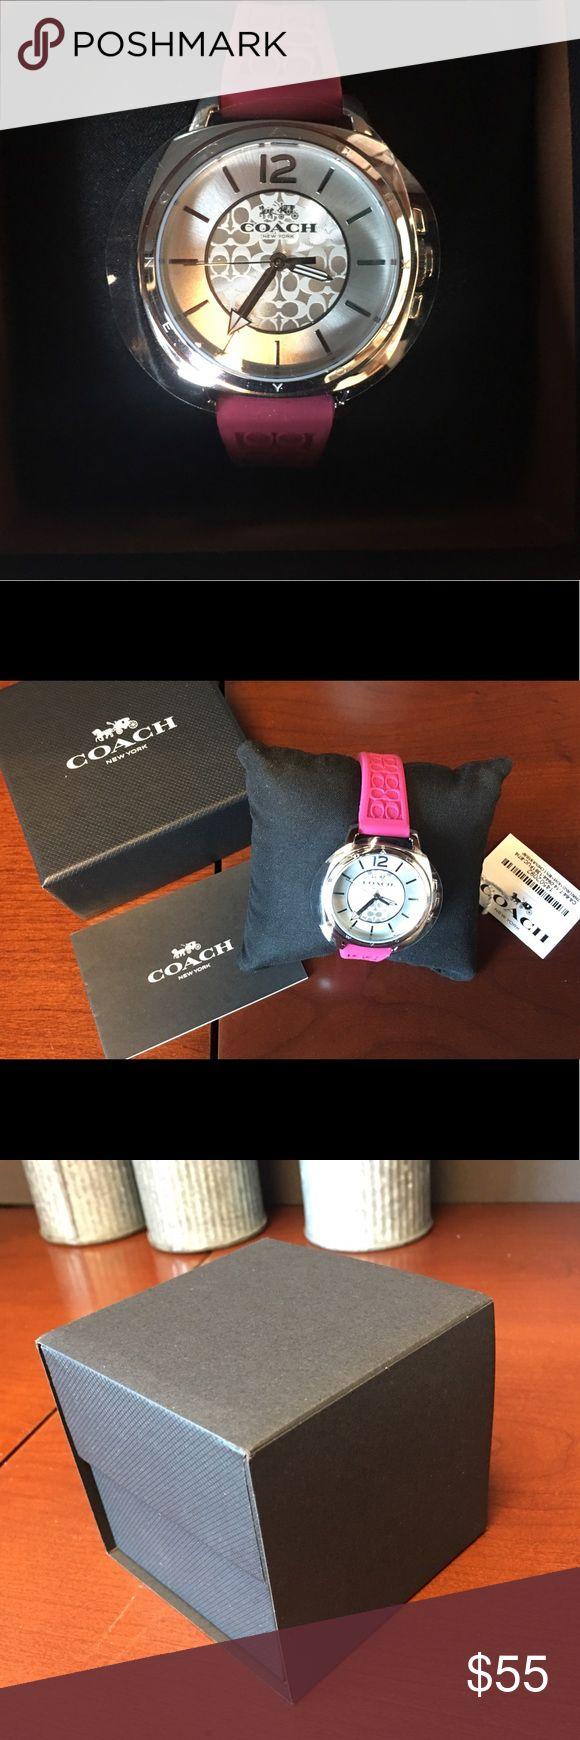 Coach Boyfriend Watch – BRAND NEW! Pink Silicone Brand new with box, price tag, cushion, plastic seals Coach boyfriend watch with pink silicone band. …